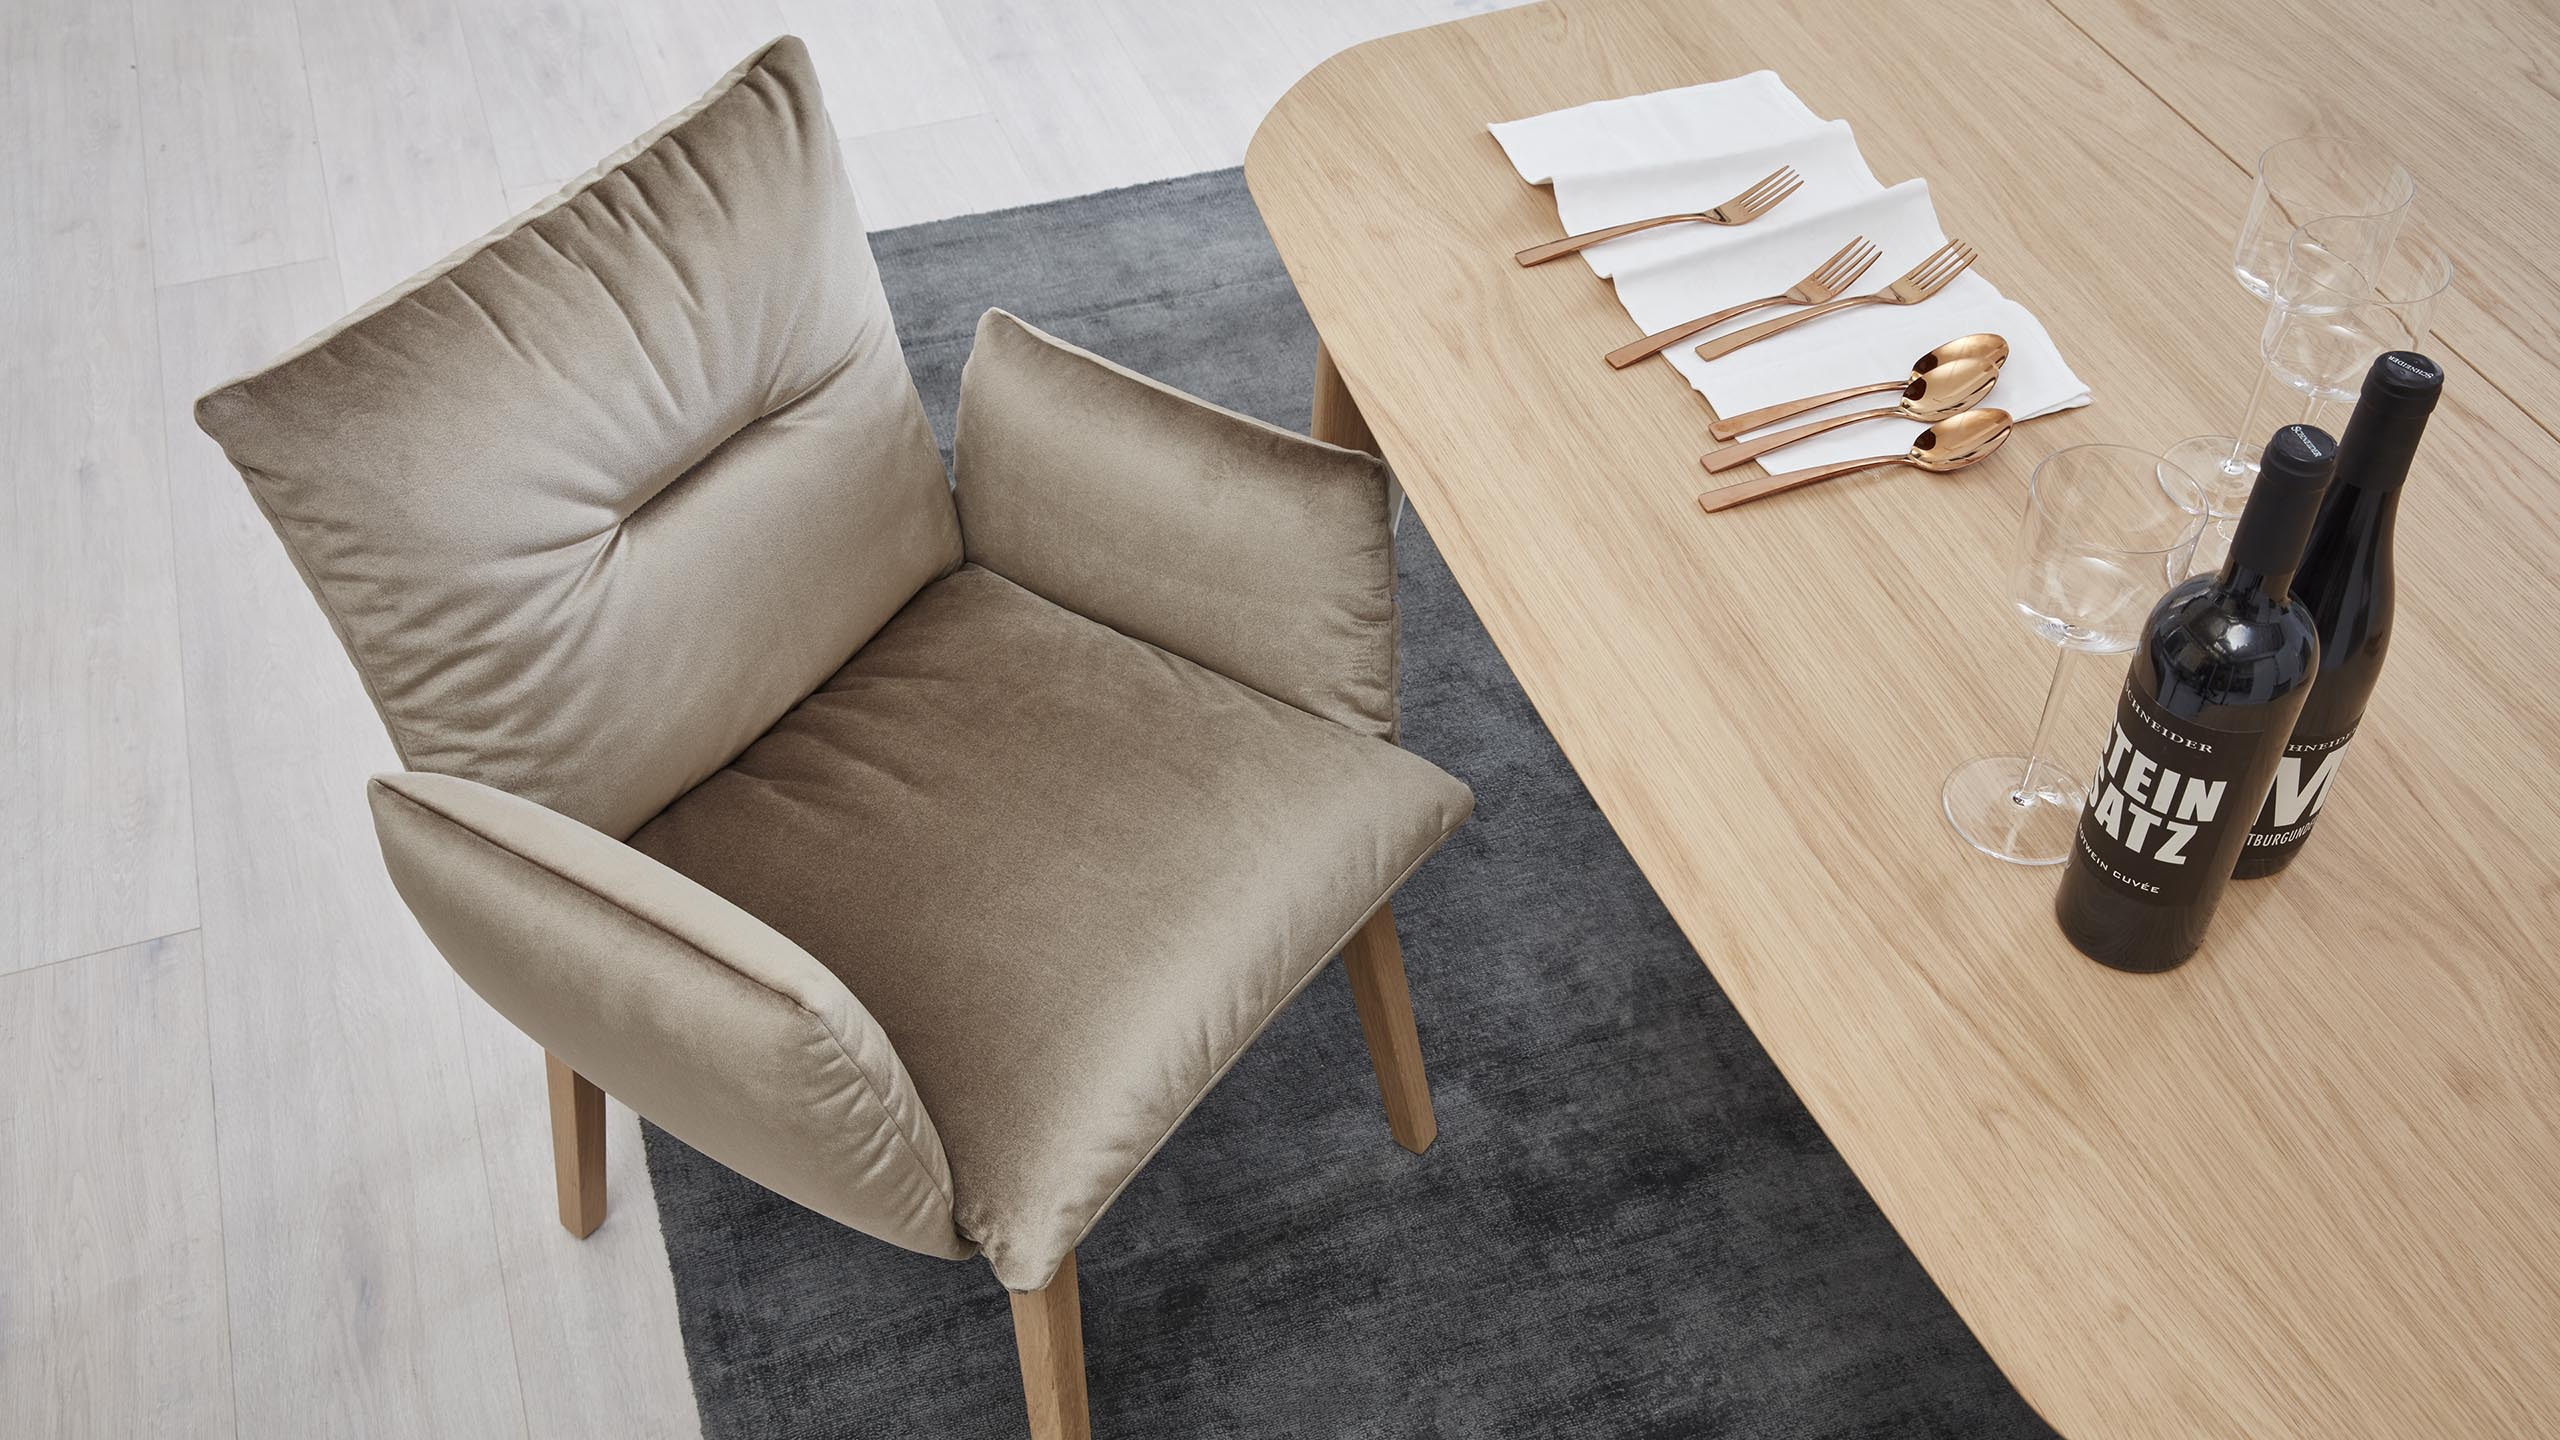 st hle ohne armlehne st hle b nke tische esszimmer m bel m bel fischer. Black Bedroom Furniture Sets. Home Design Ideas